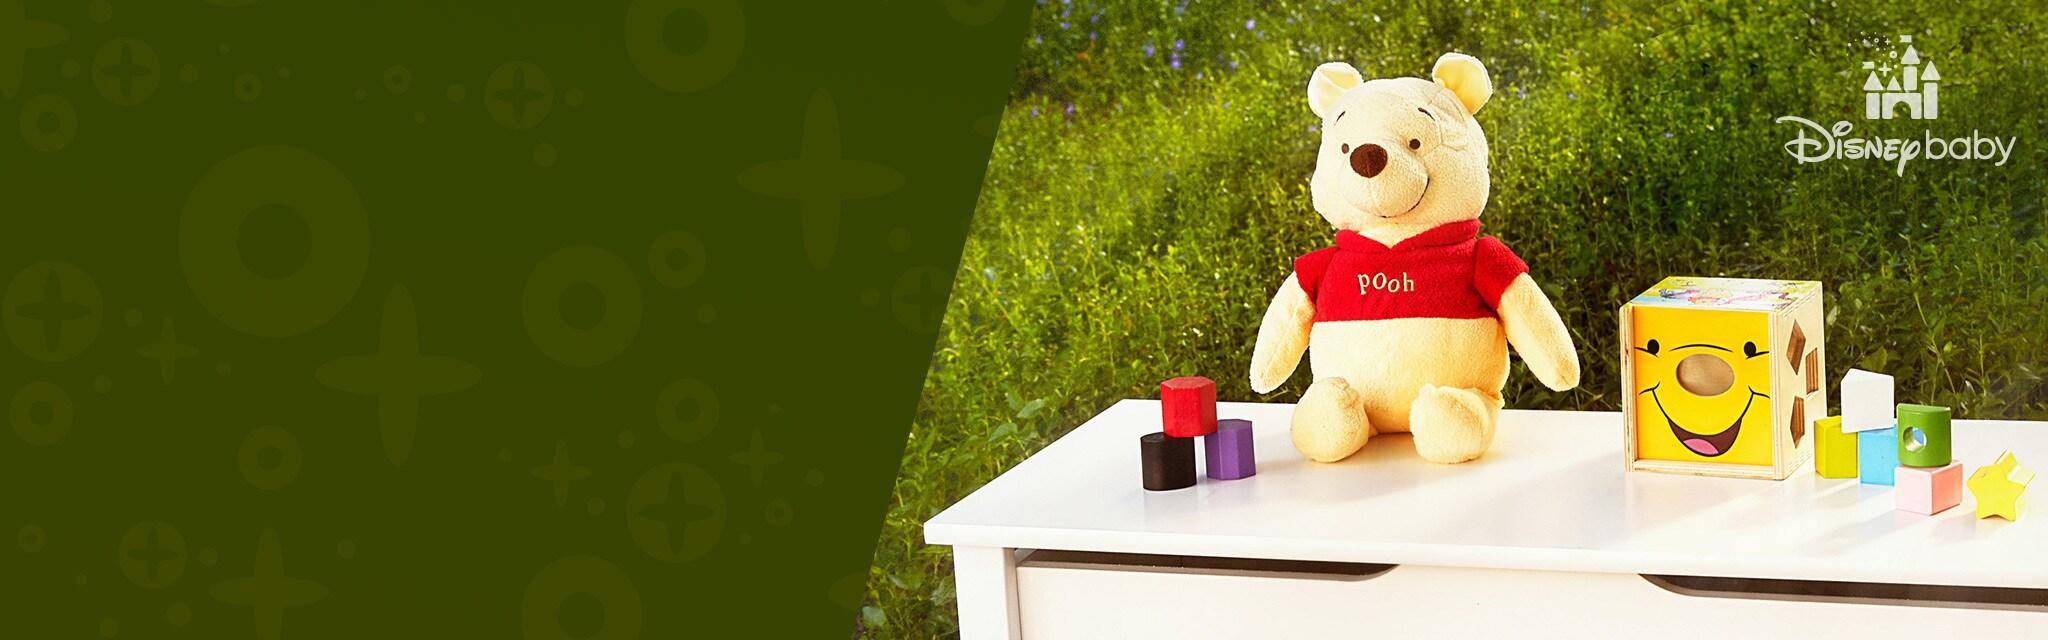 Winnie the Pooh - Disney Baby Spring - Hero